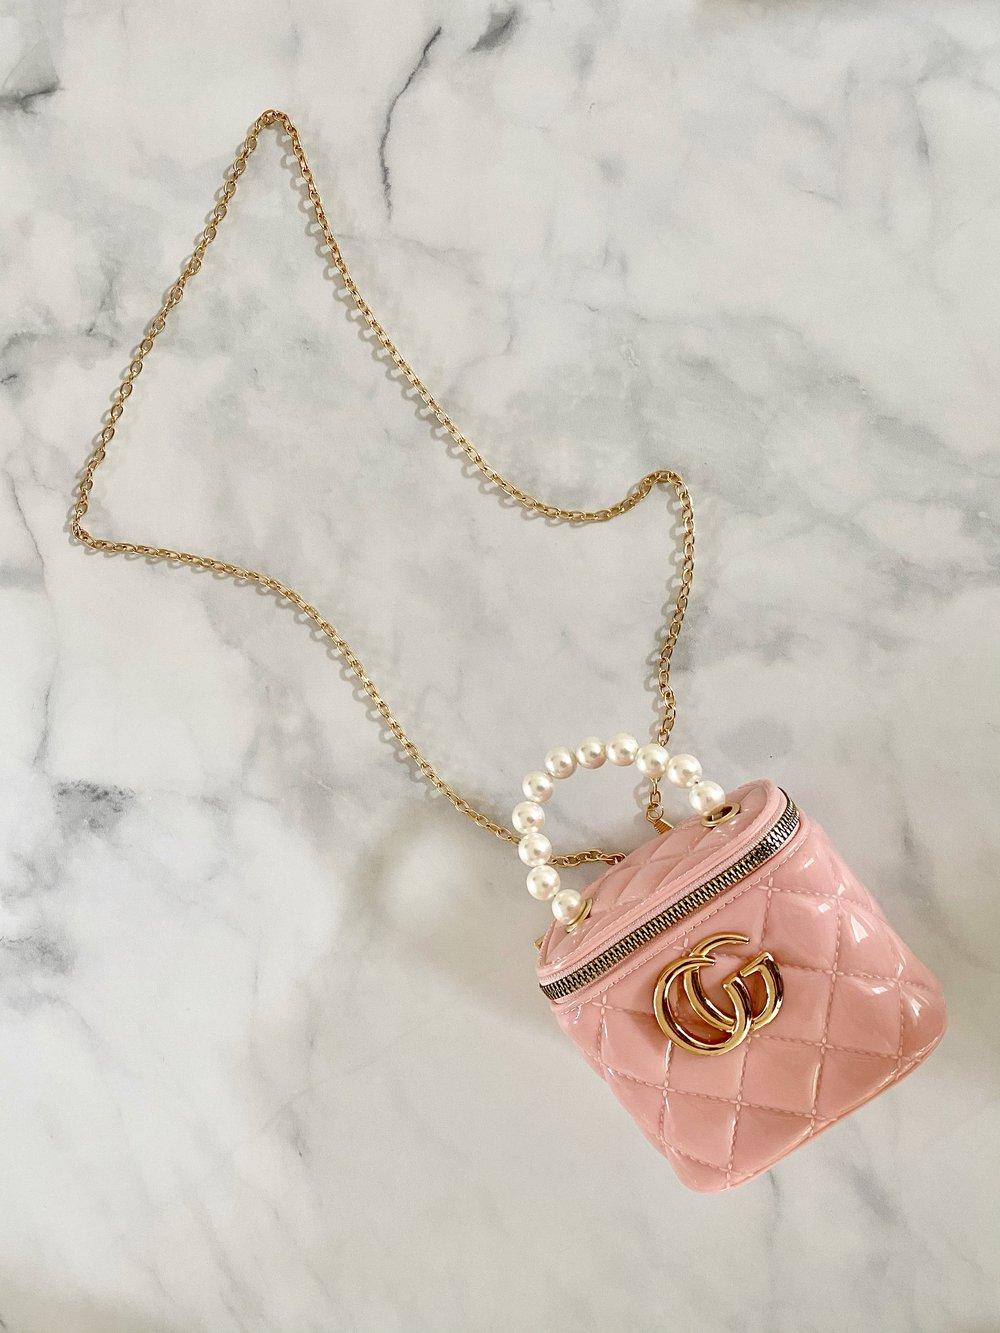 Stay Trending Mini Bag (Pink)